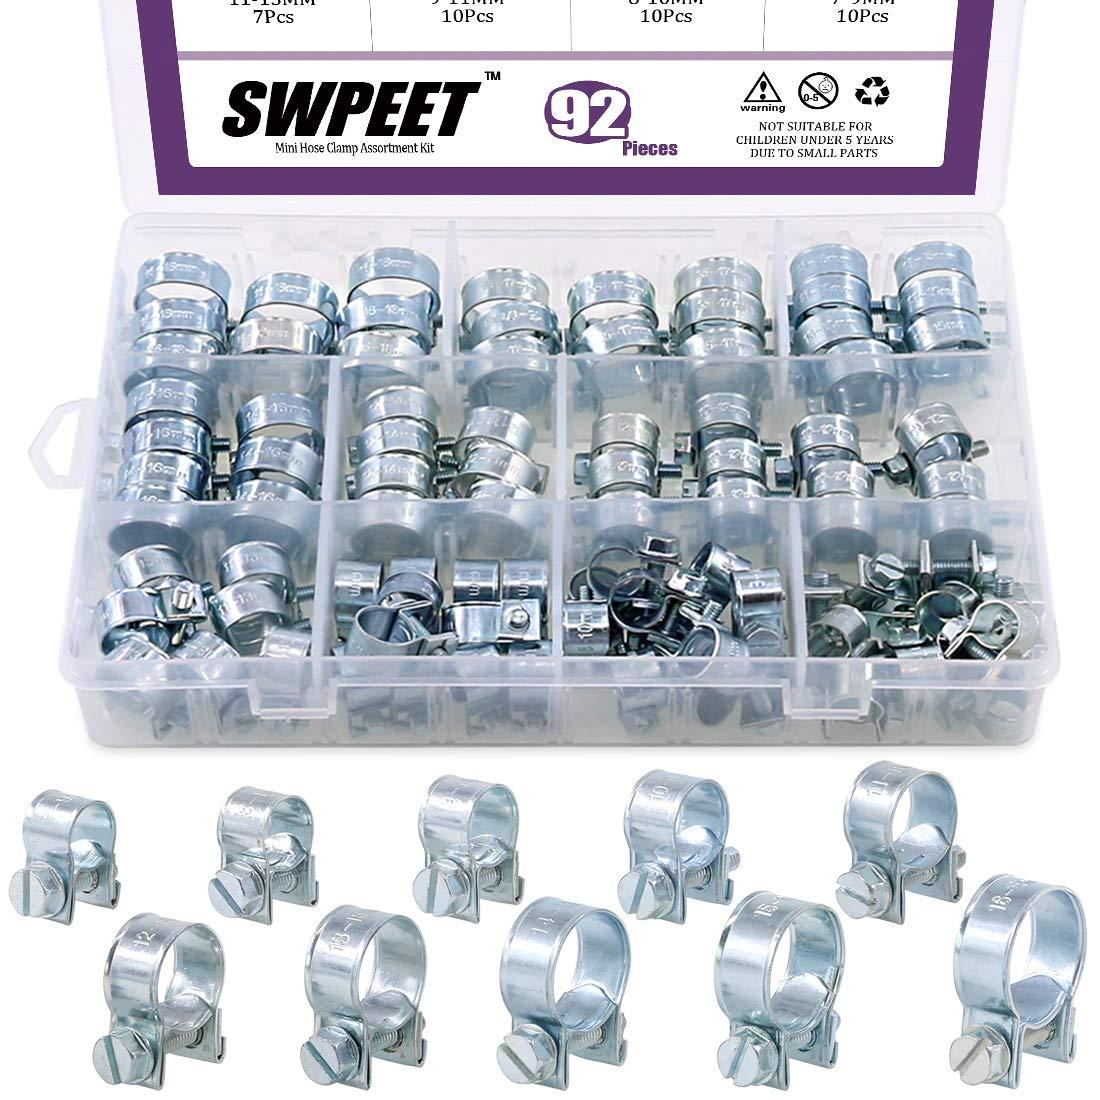 Swpeet 92Pcs 10 Sizes Zinc Plated Mini Fuel Injection Line Style Hose Clamp Assortment Kit Perfect for Automotive, Agriculture, Plant & Construction